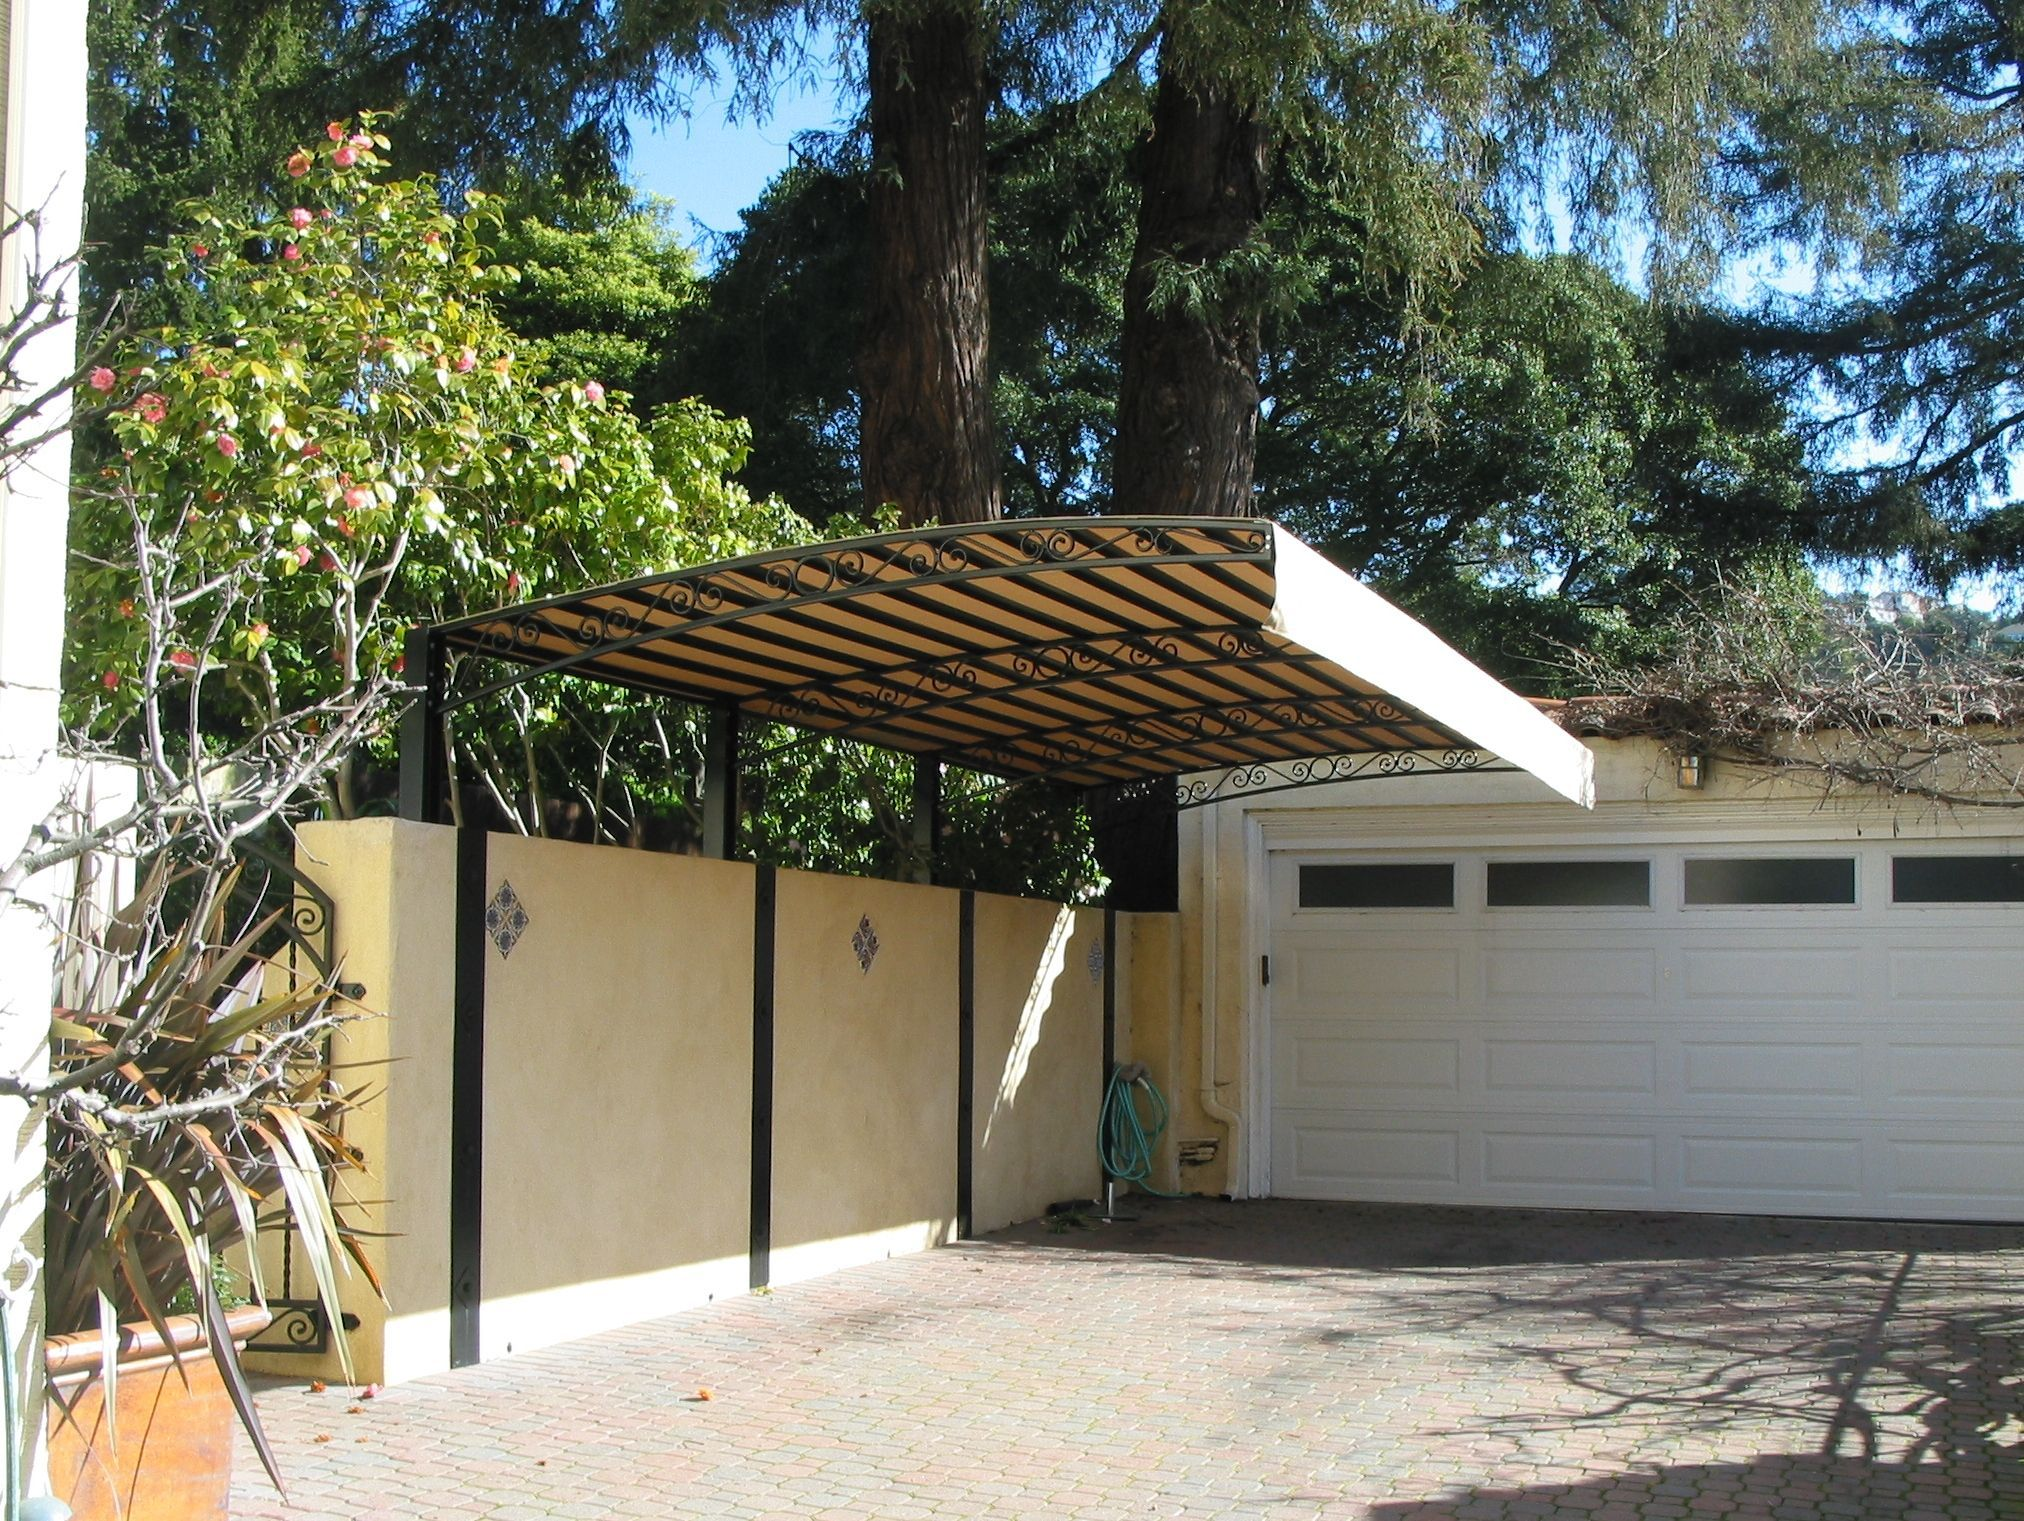 13 Prodigious Malay Wedding Canopy Ideas Carport Canopy Canopy Outdoor Carport